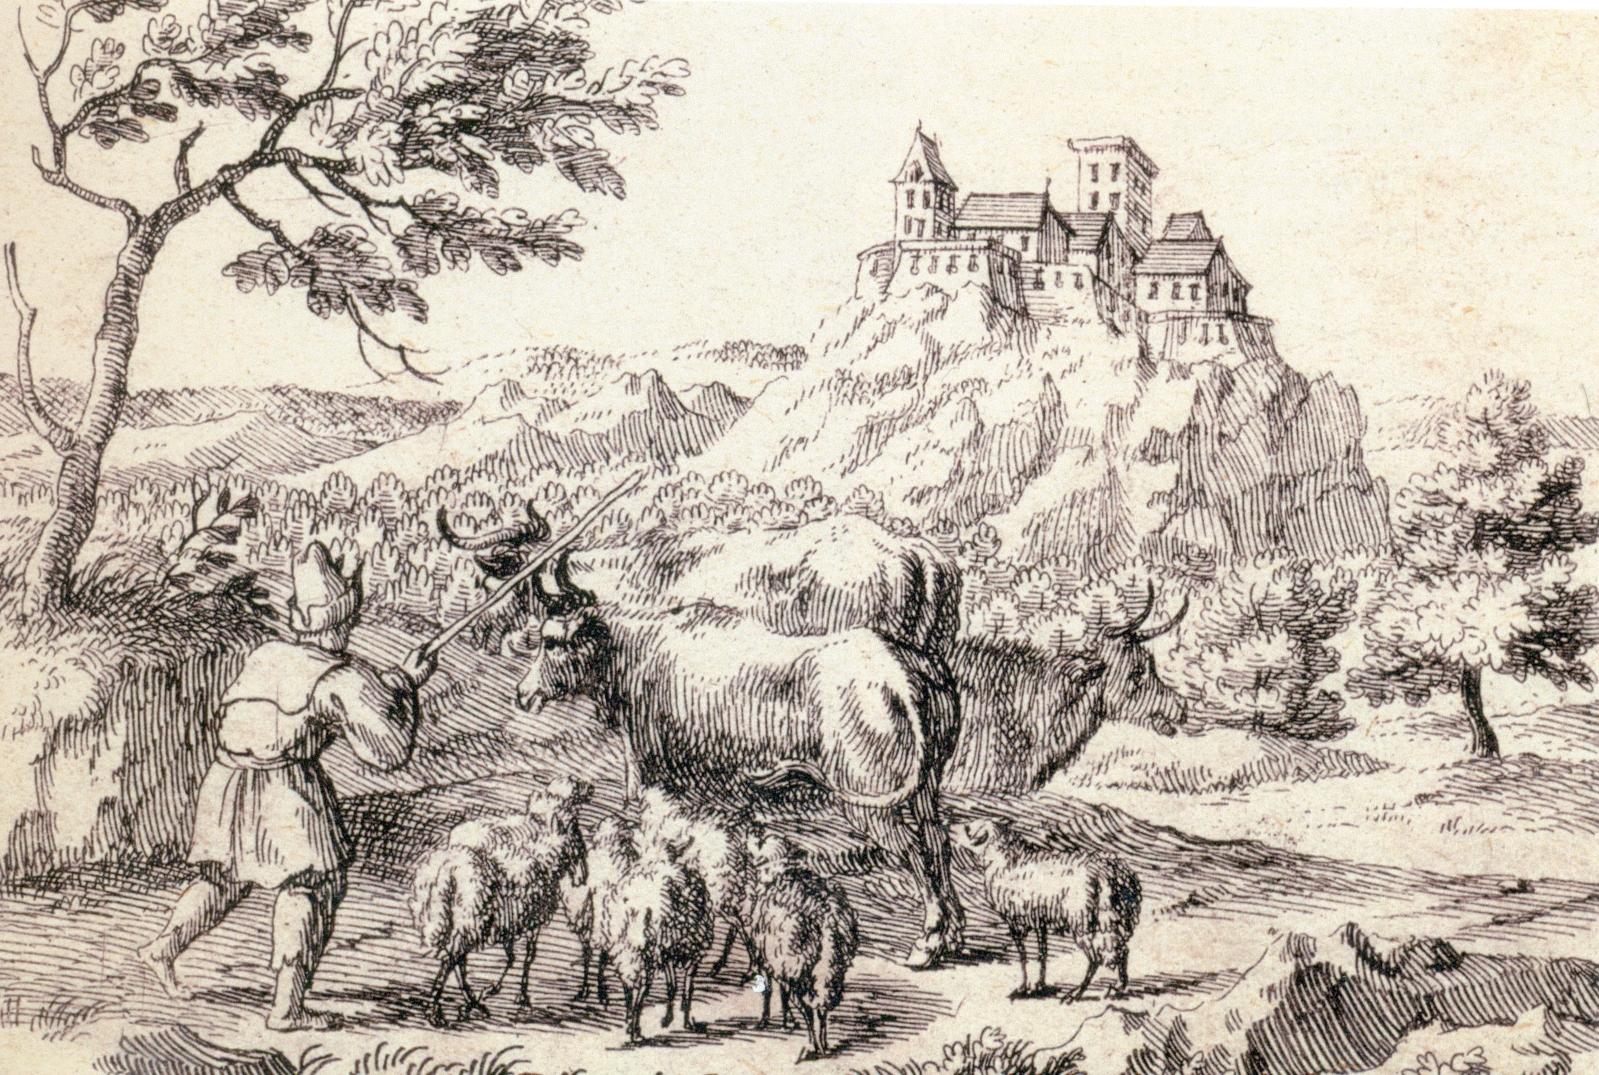 File:Justus van der Nypoort, 1686, Csesznek, cattle driver.jpg